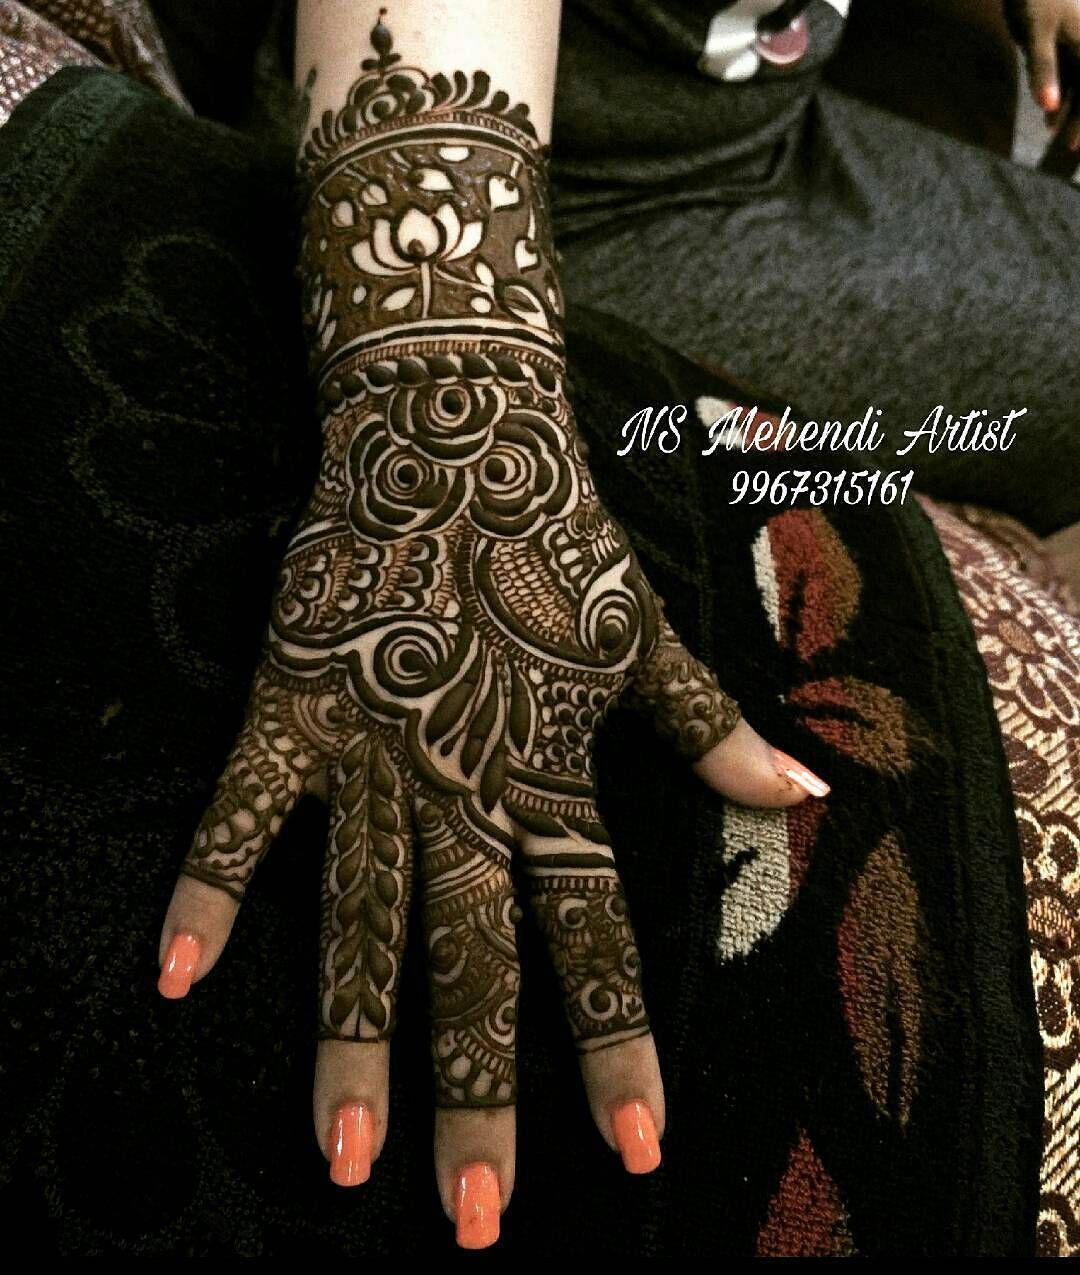 5 668 Likes 13 Comments Mehandi Designs Awesomemehandi On Instagram Mehandi Designs Mehndi Designs New Mehndi Designs